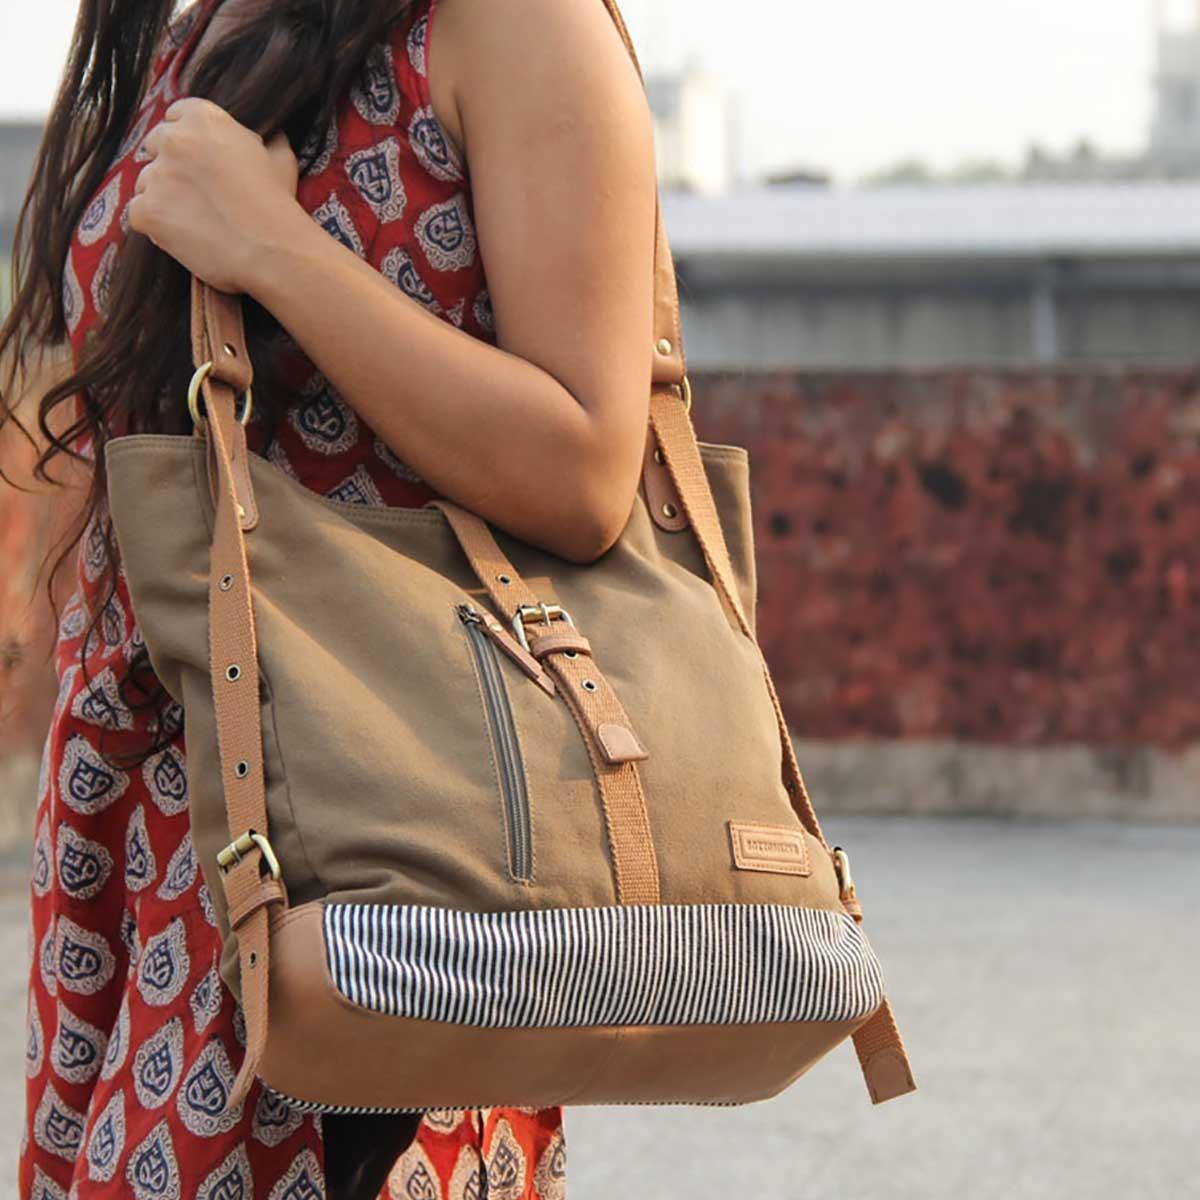 Ladies shoulder /backpack(light brown)